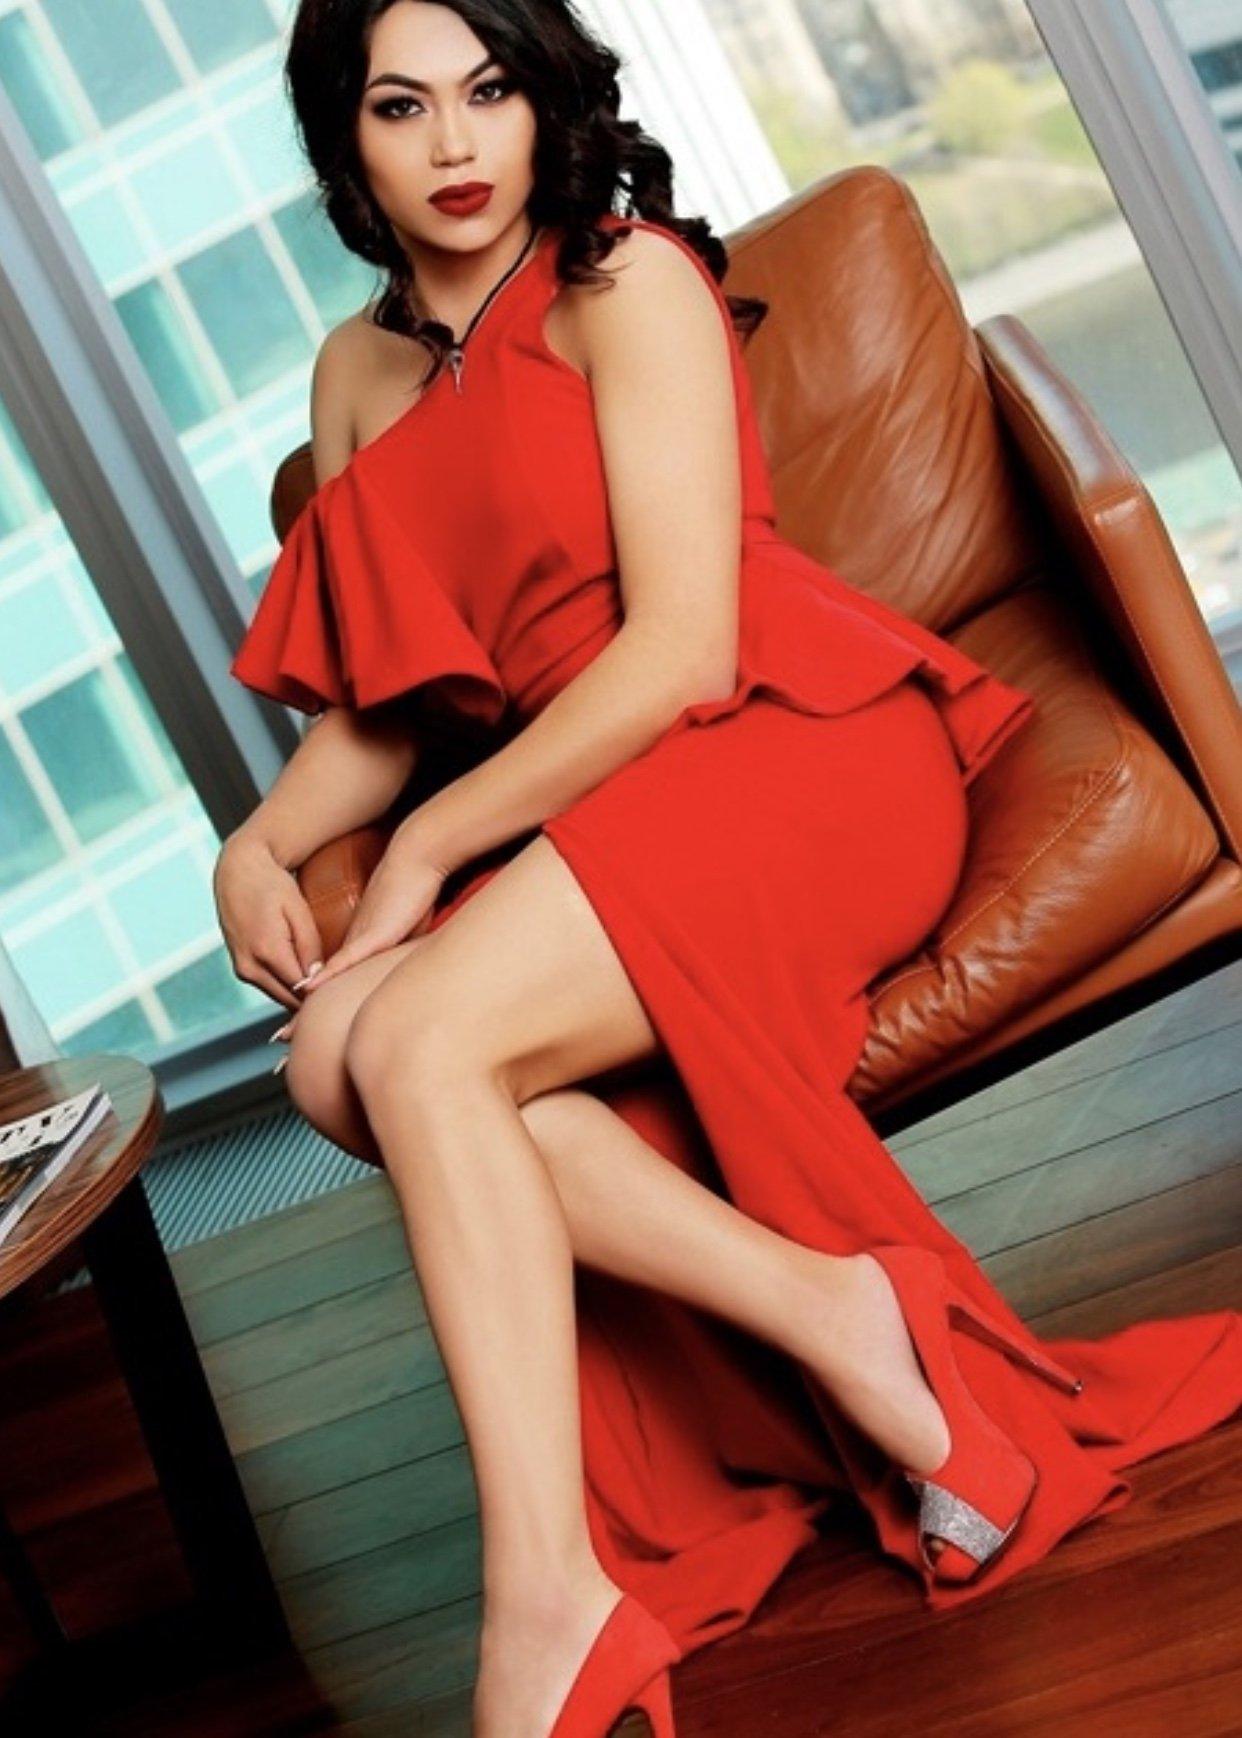 Shemale Aisha New, Iranian Transsexual escort in Dubai